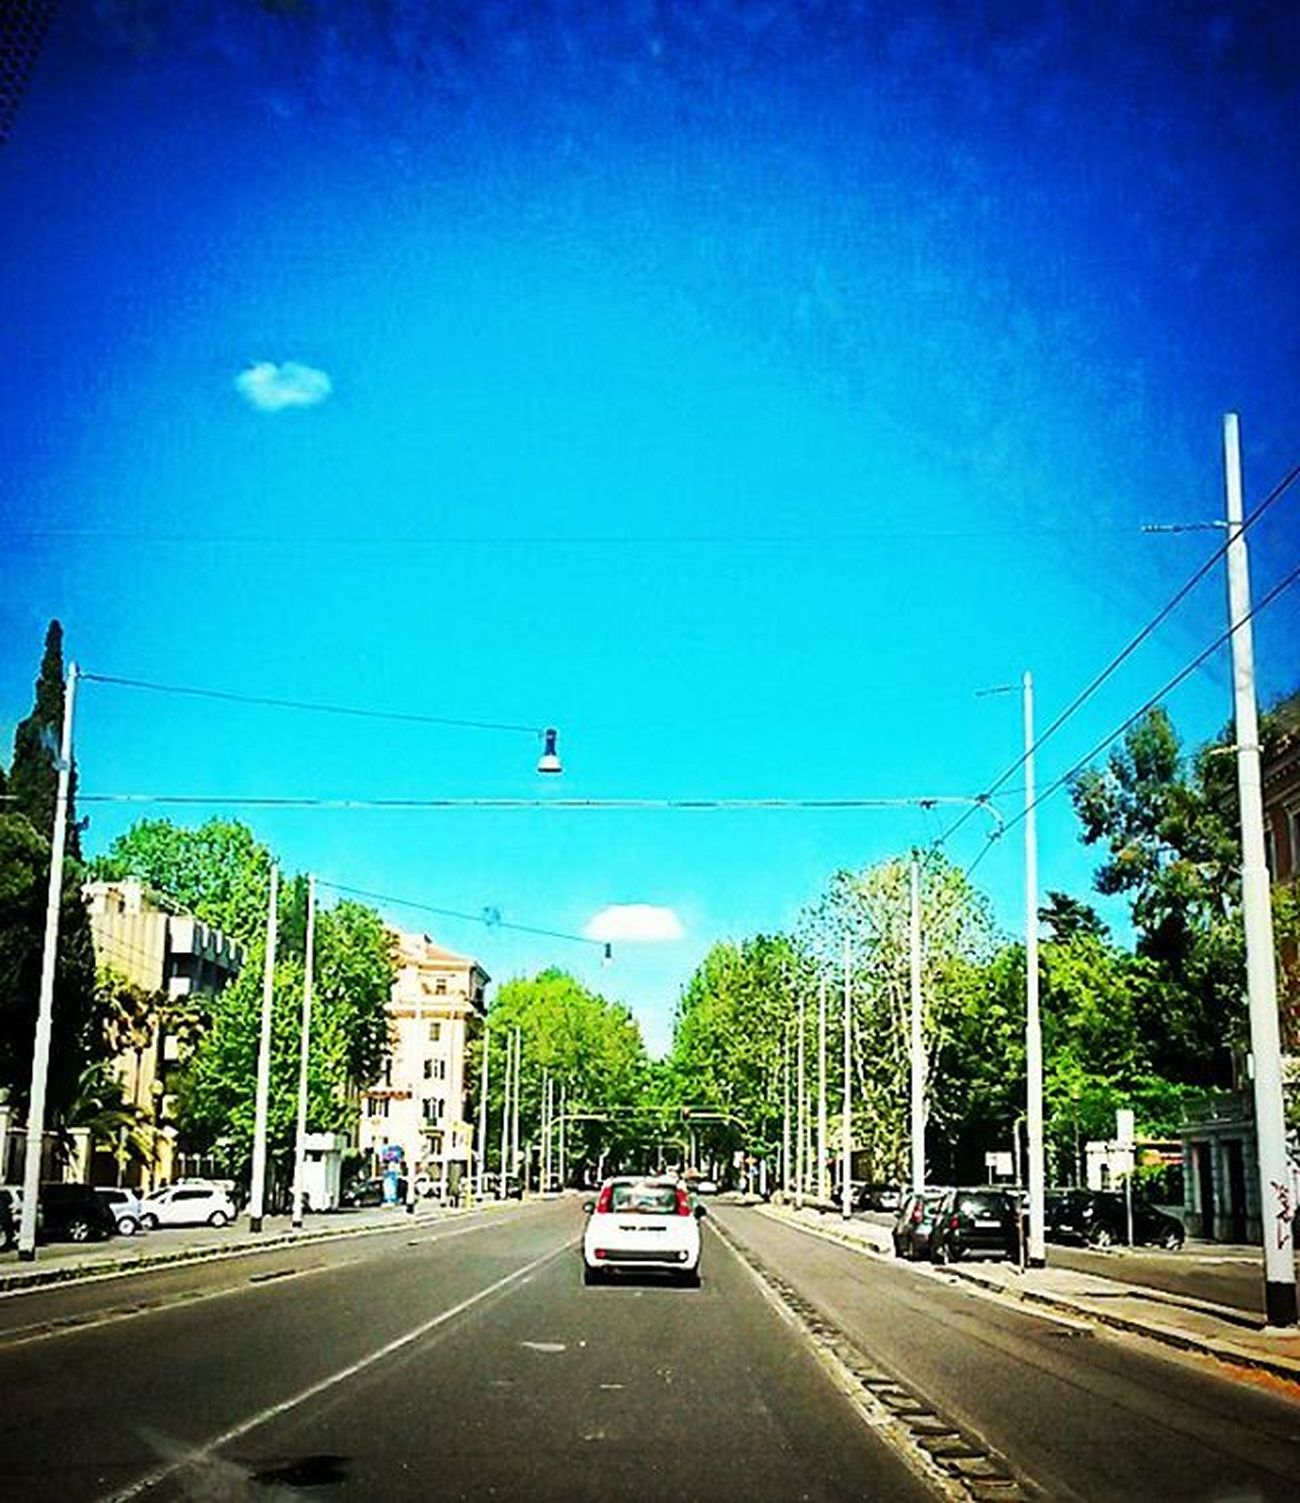 Sunny Nomentana ciaone. Nomentana Sunnyday Sun Street Rome Roma Light Spring Sky Sole Strada Luce Cielo Blue